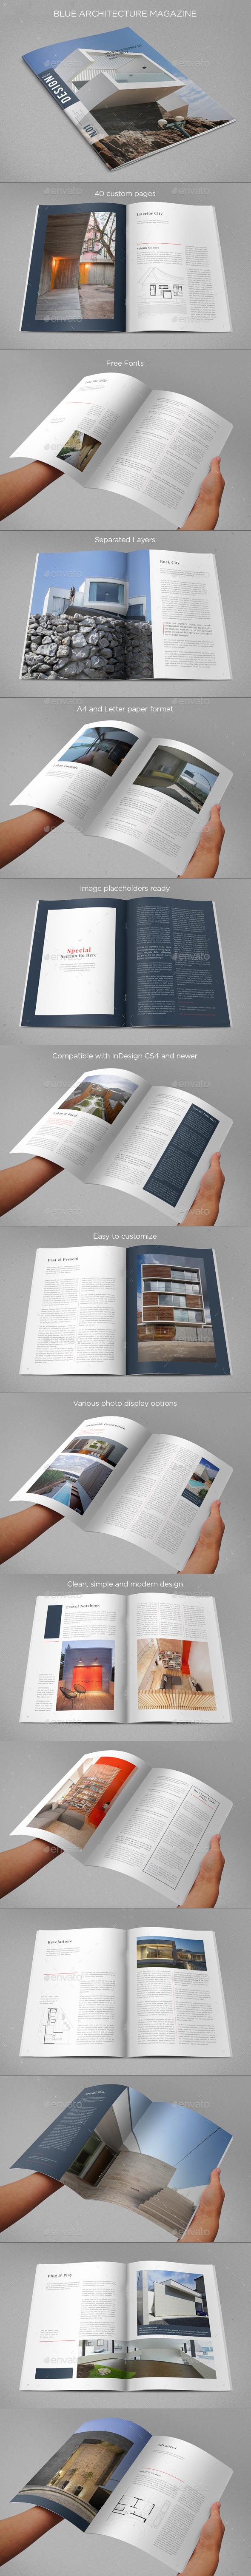 Blue Architecture Magazine - Magazines Print Templates